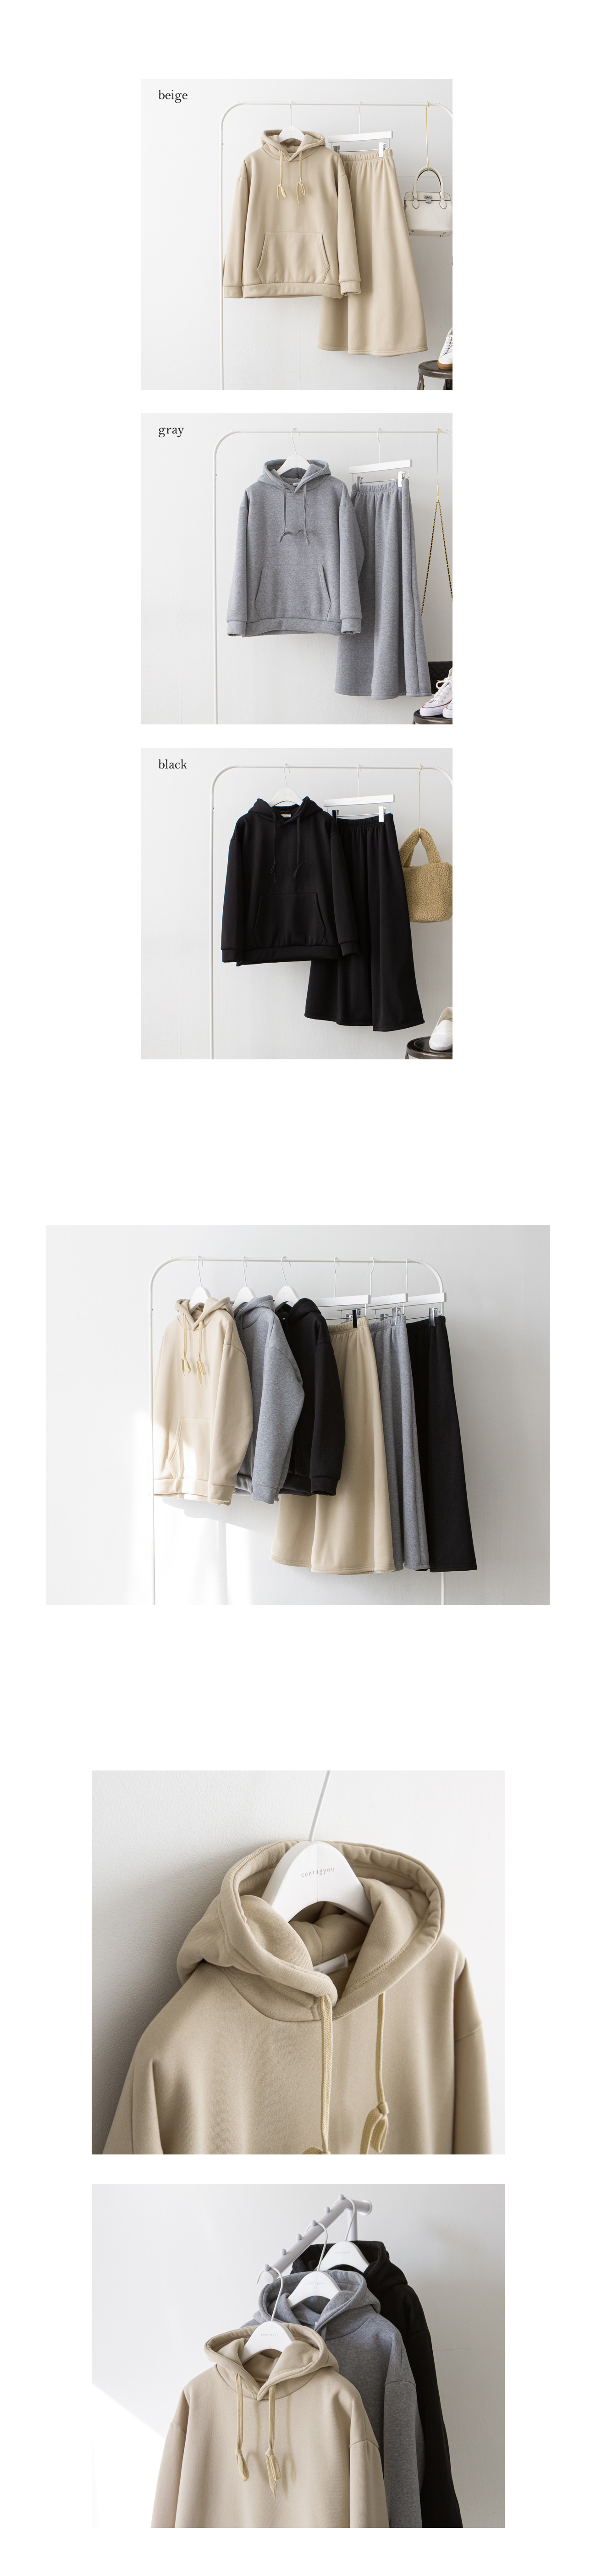 Winter Fleece-lined Training Set #92591